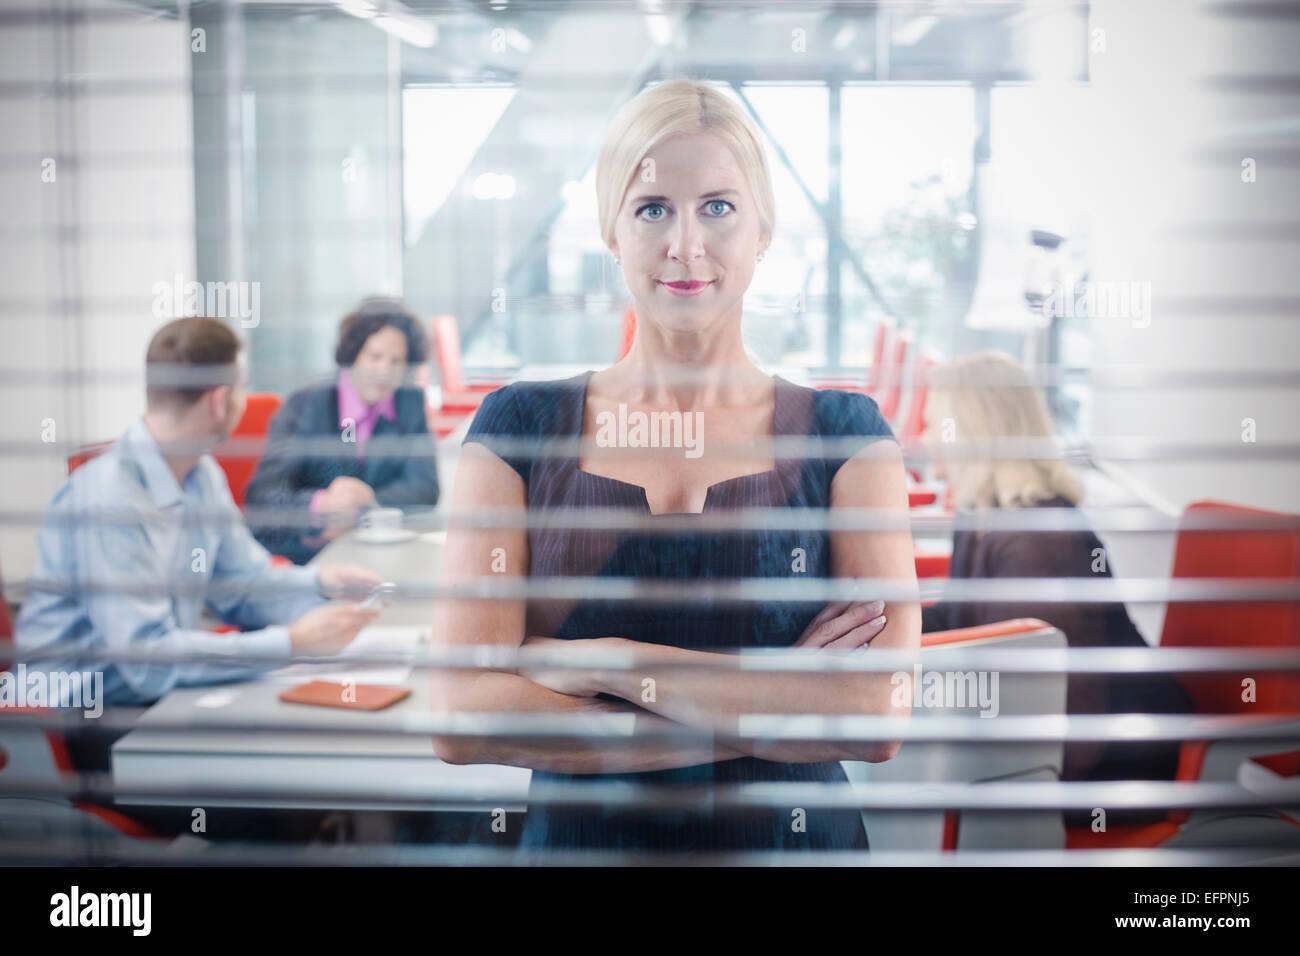 Mid adult woman behind window - Stock Image